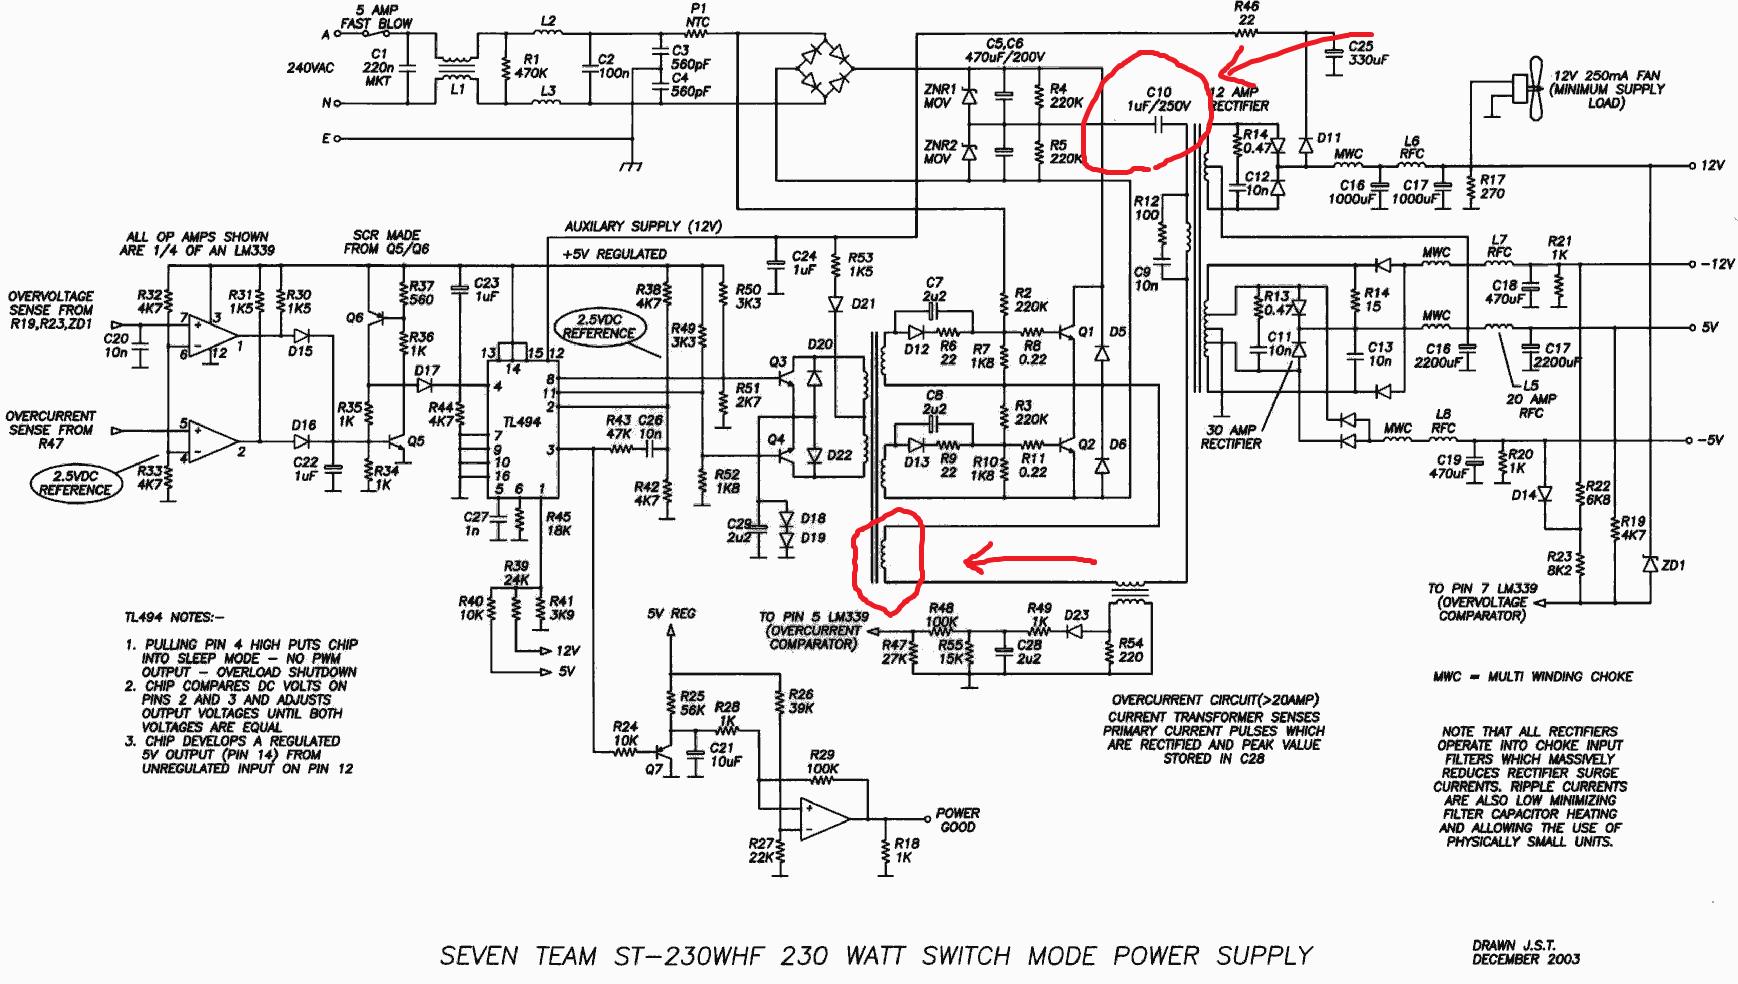 200x Wiring Diagram Power Supply Half Bridge Converter Electrical